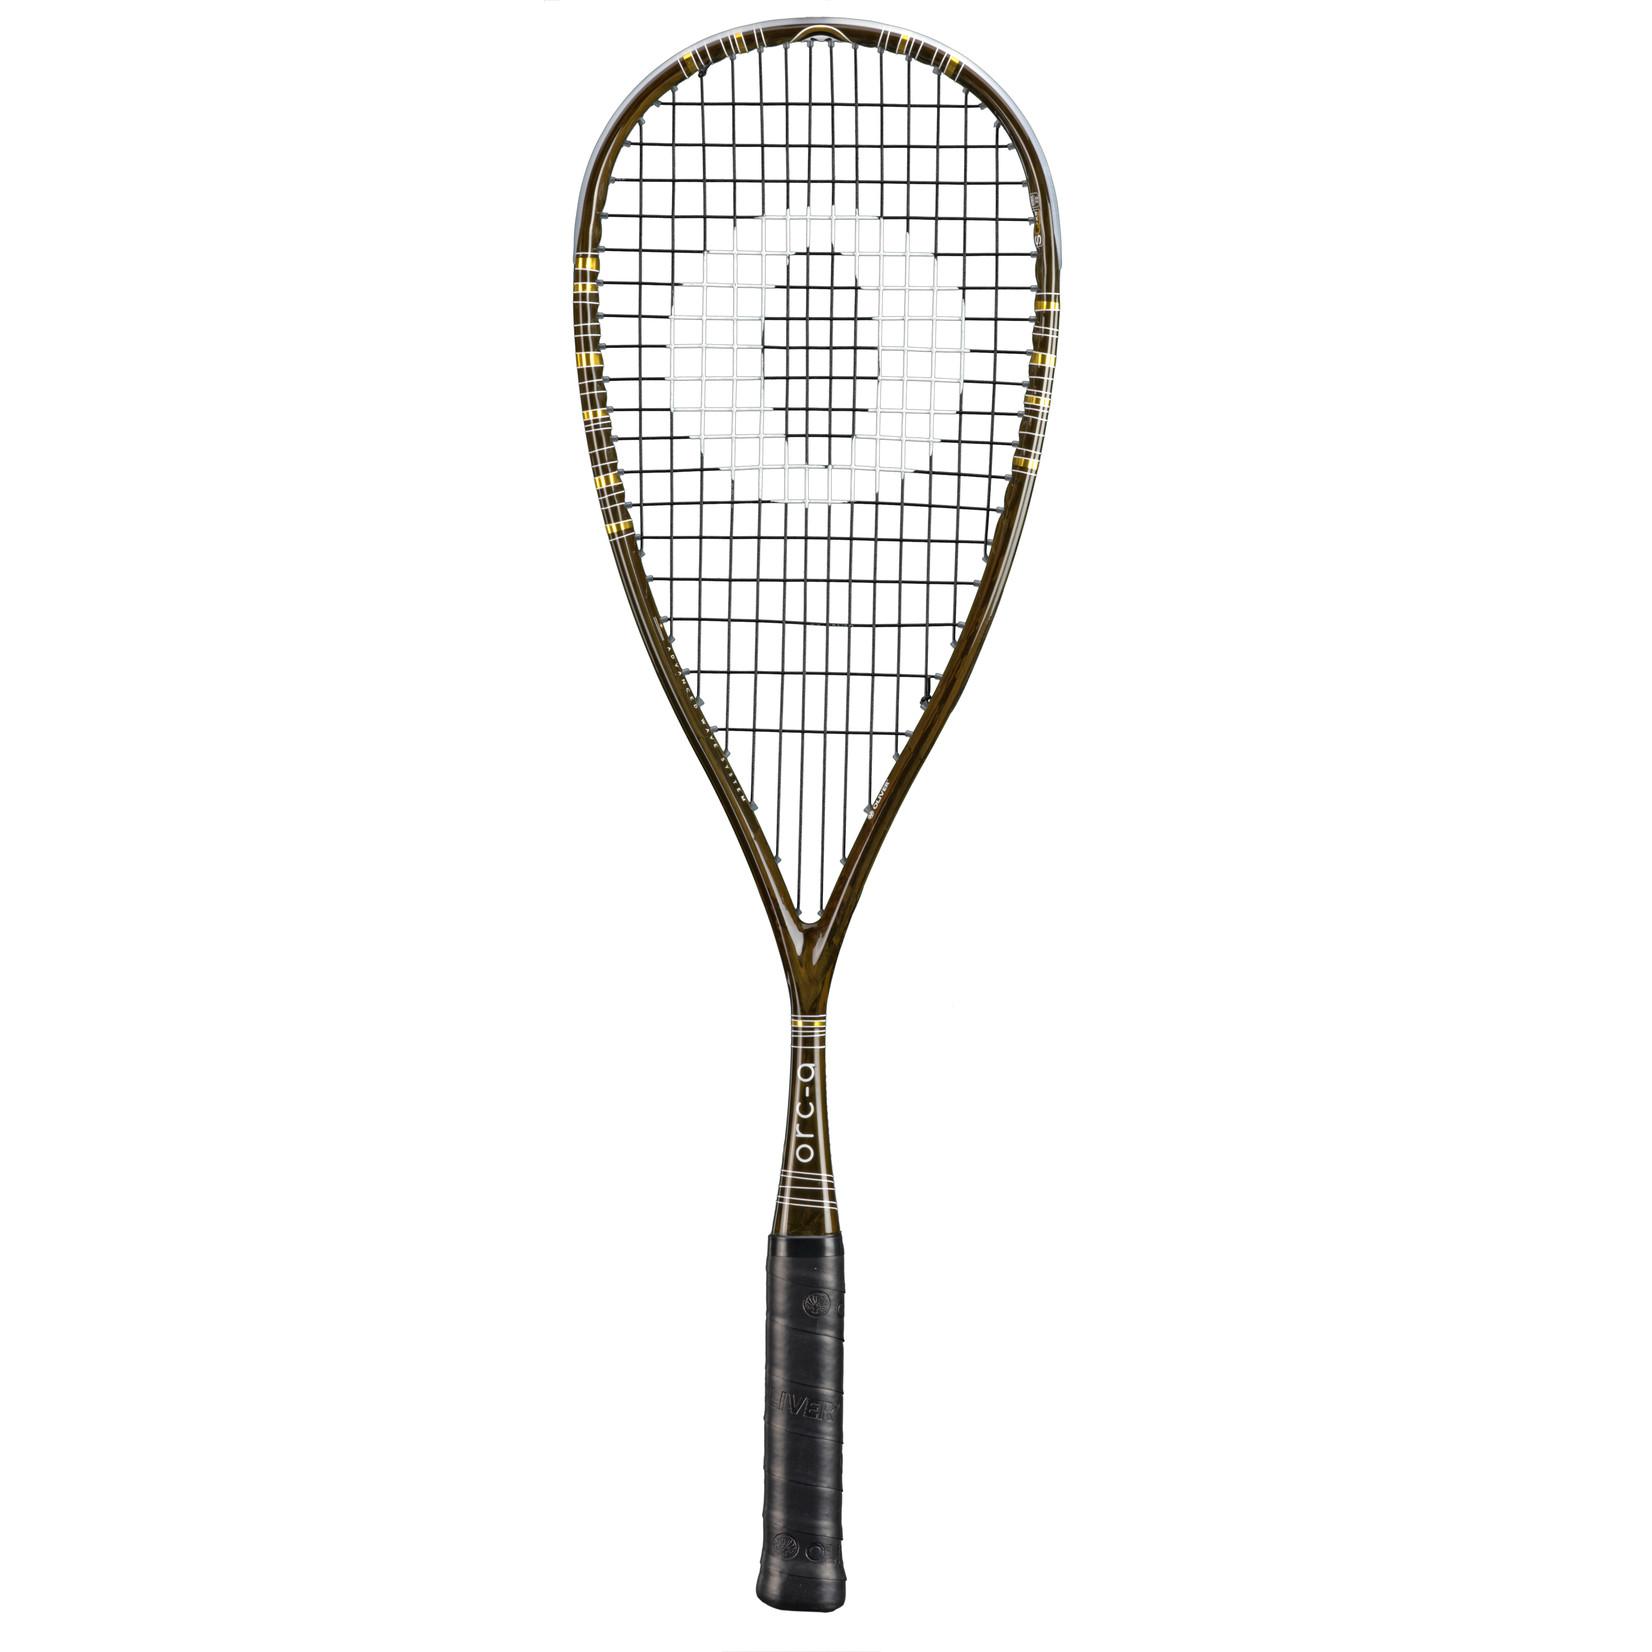 Oliver Orc A Supralight squashracket